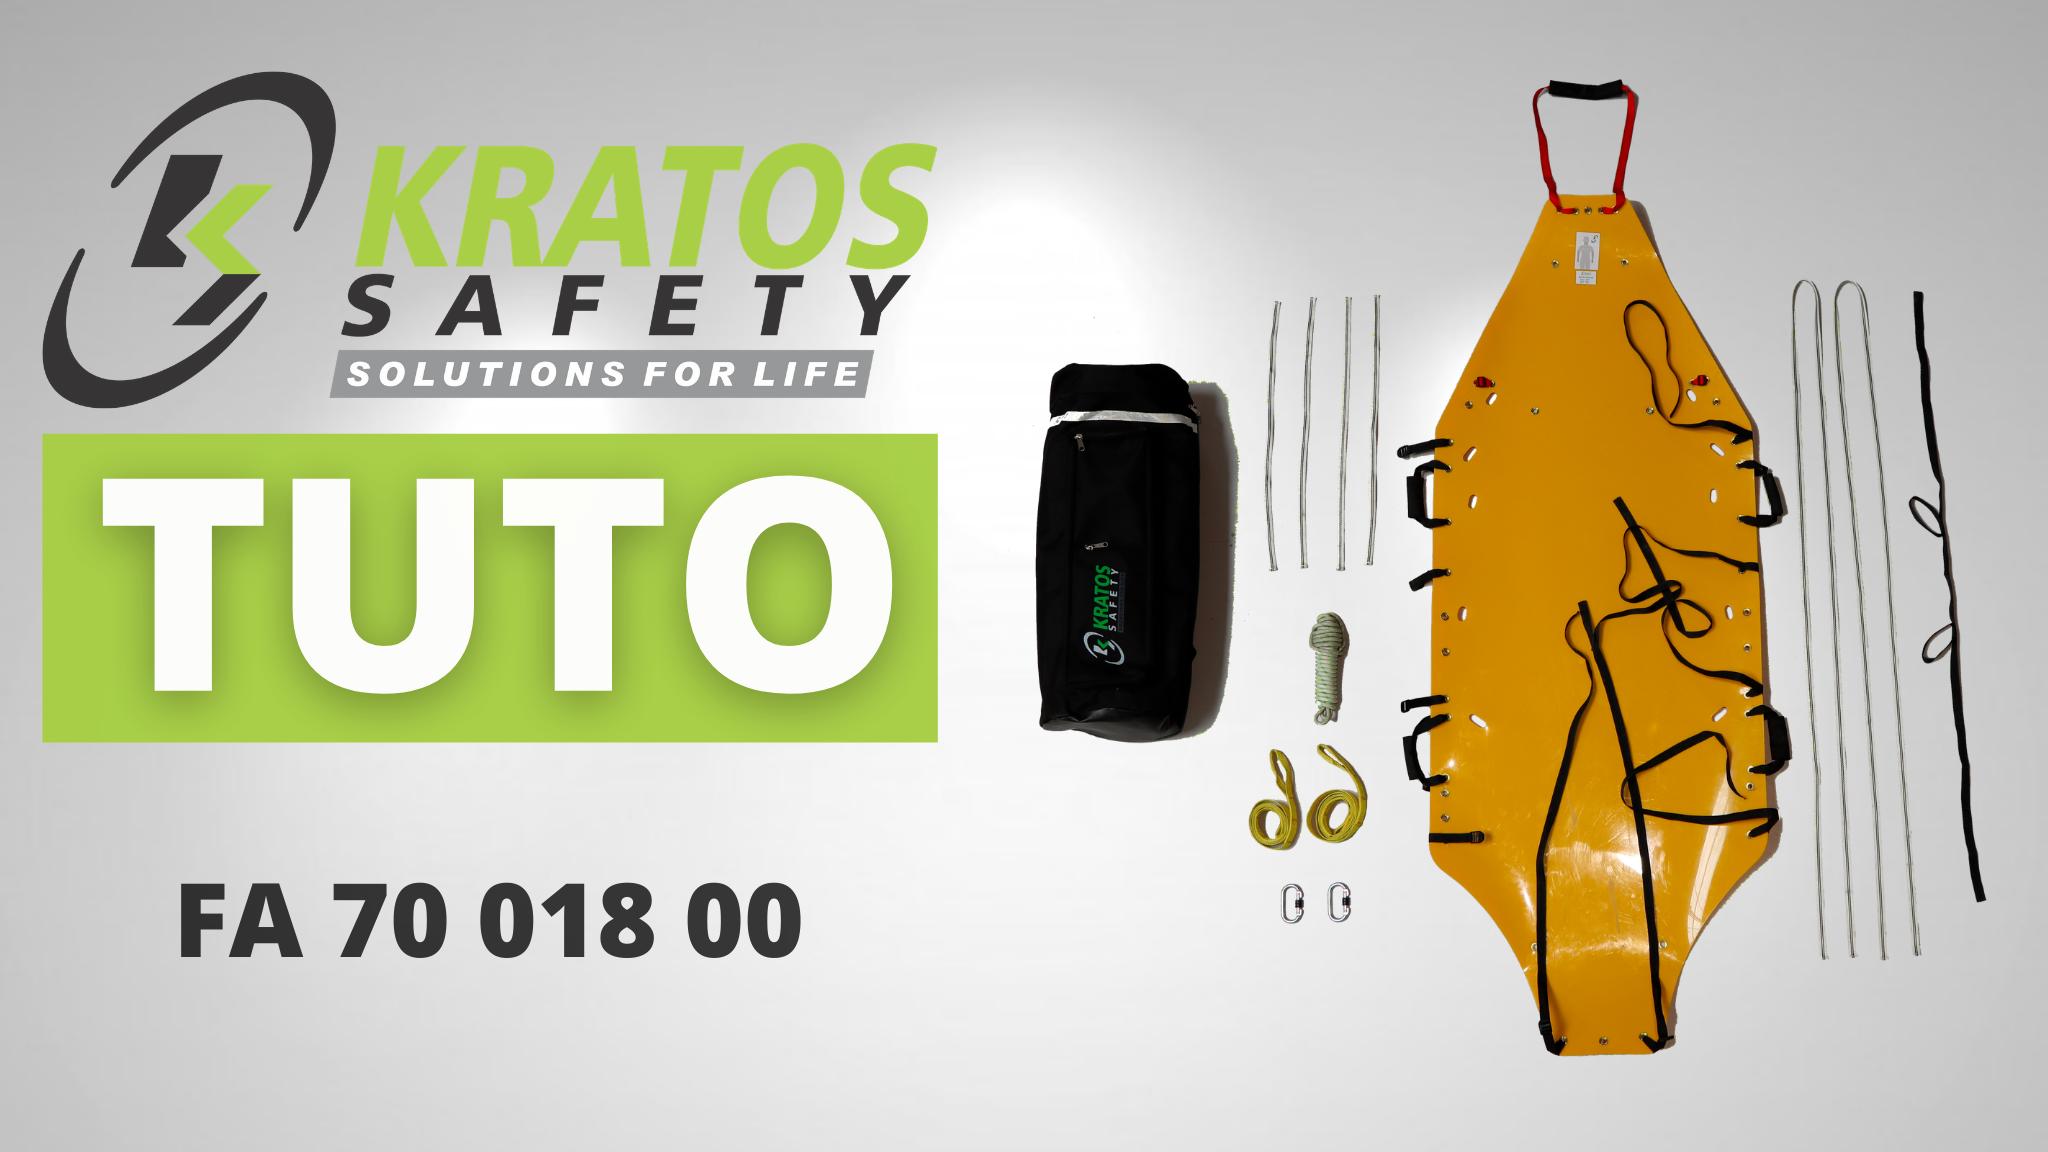 kratoss Safety